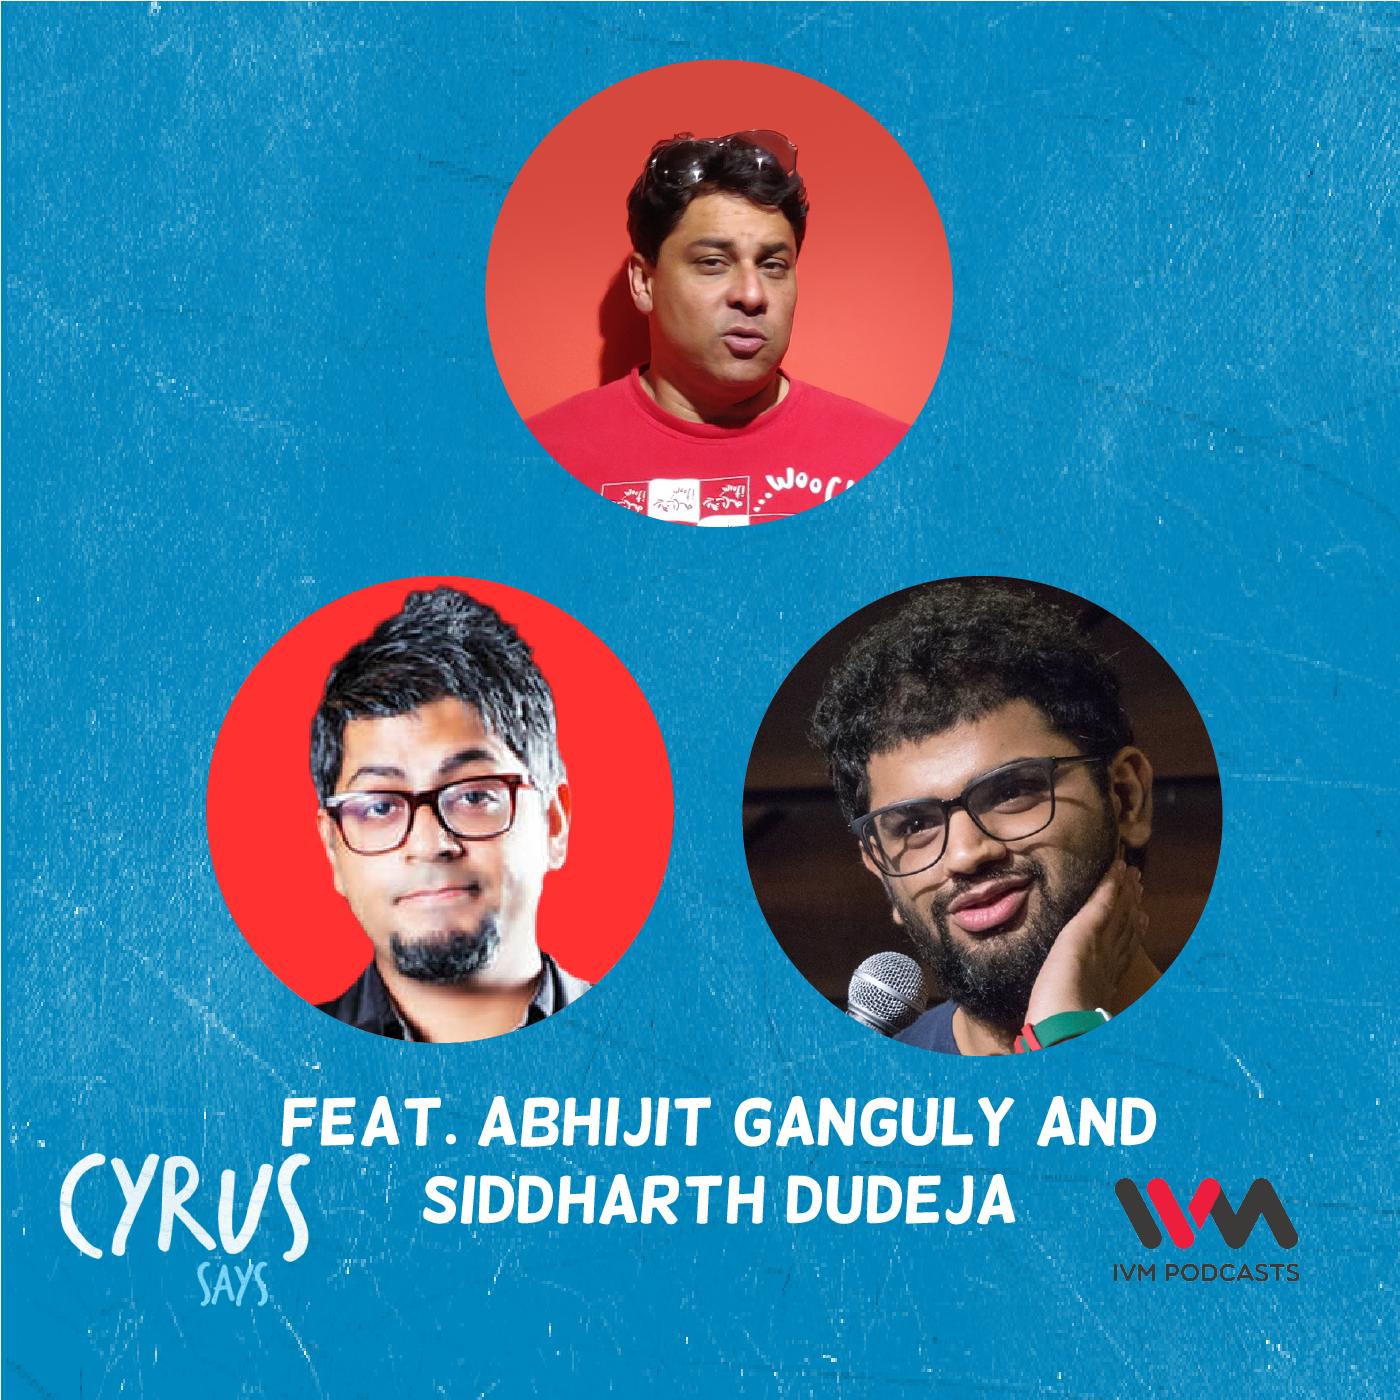 Ep. 611: feat. Abijit Ganguly and Siddharth Dudeja